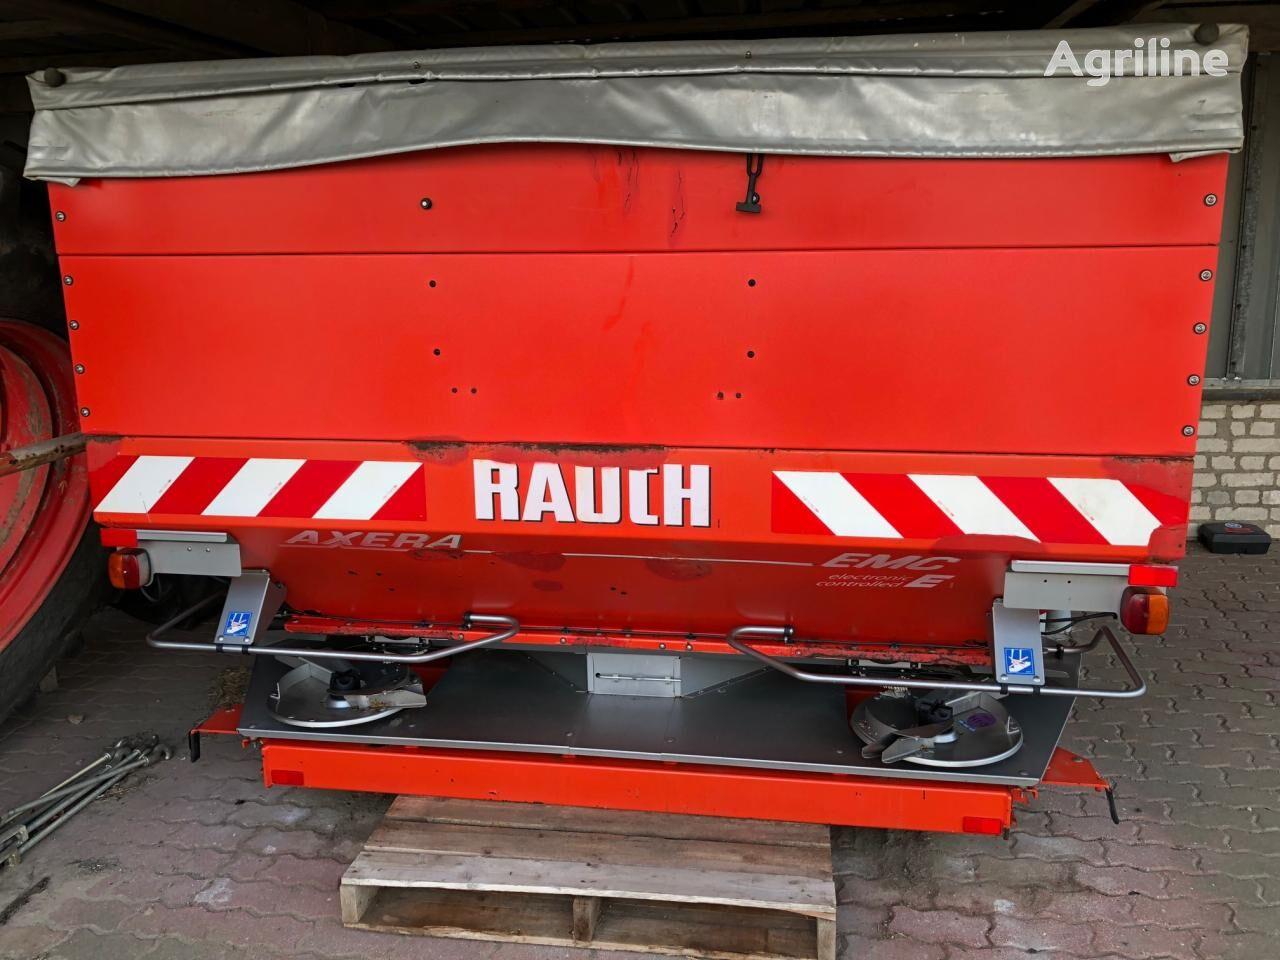 RAUCH AXERA H EMC fertiliser spreader